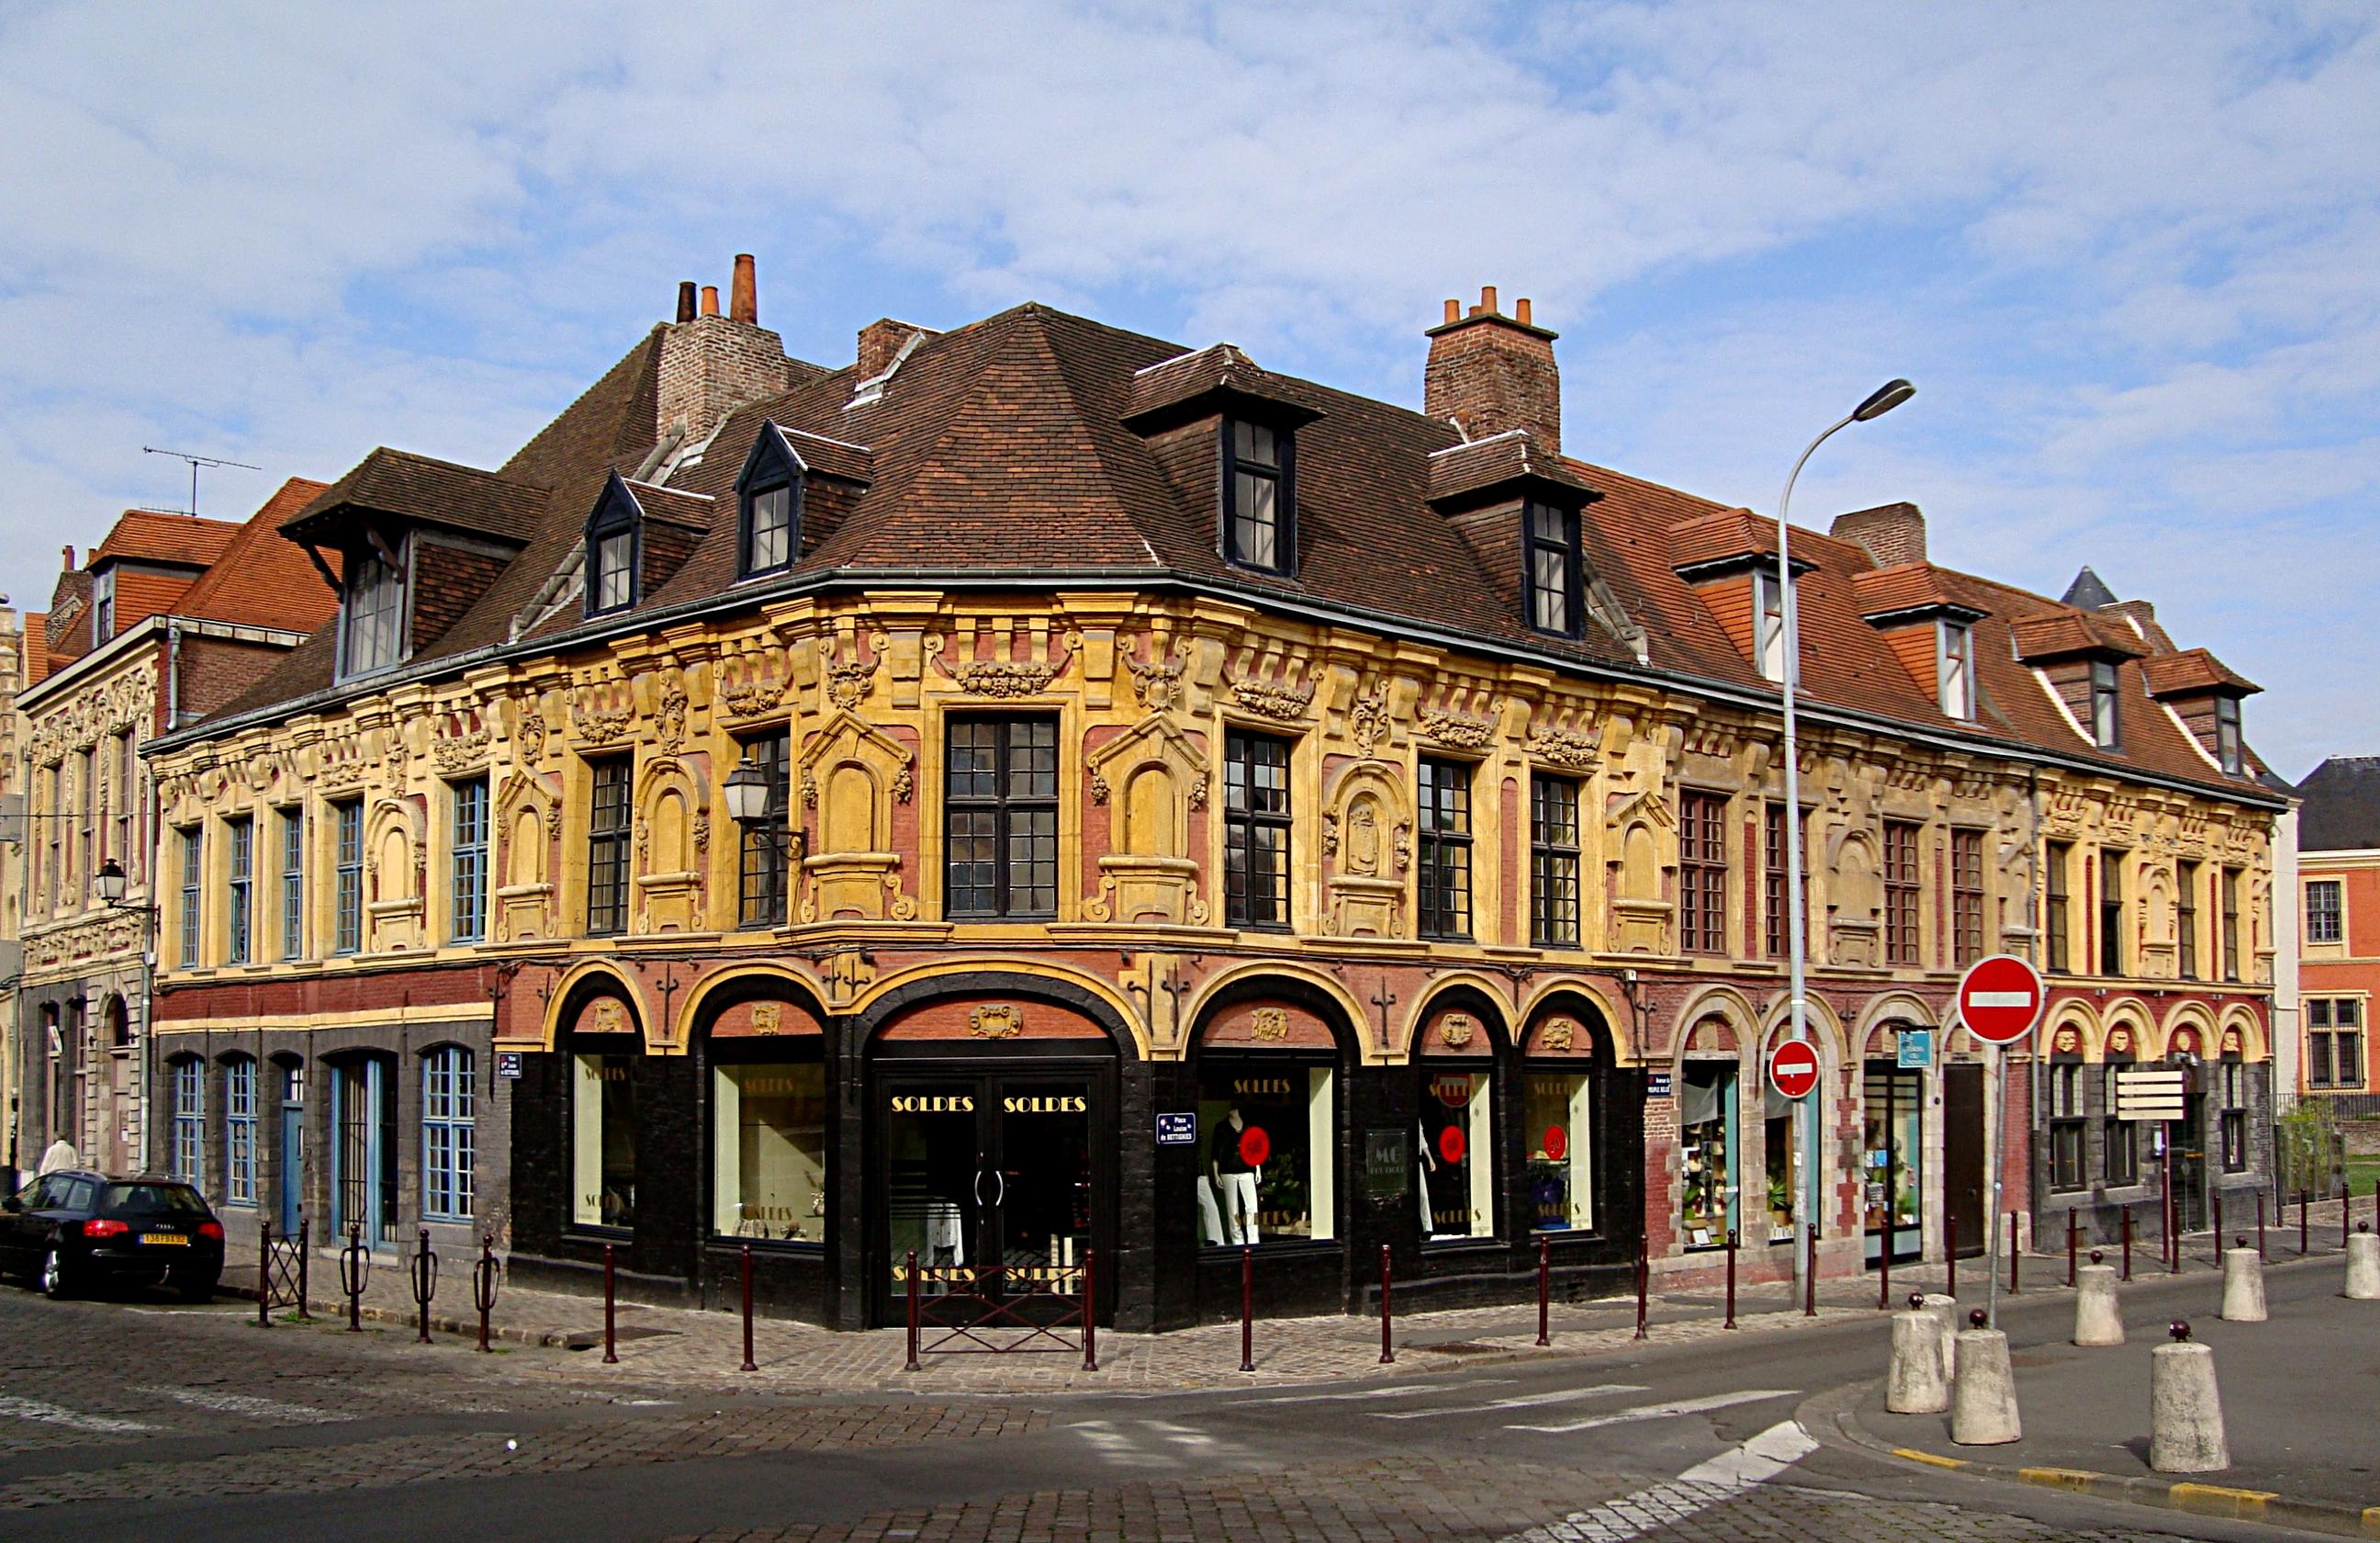 https://upload.wikimedia.org/wikipedia/commons/9/9f/Lille_maison_de_gille_le_boe.JPG